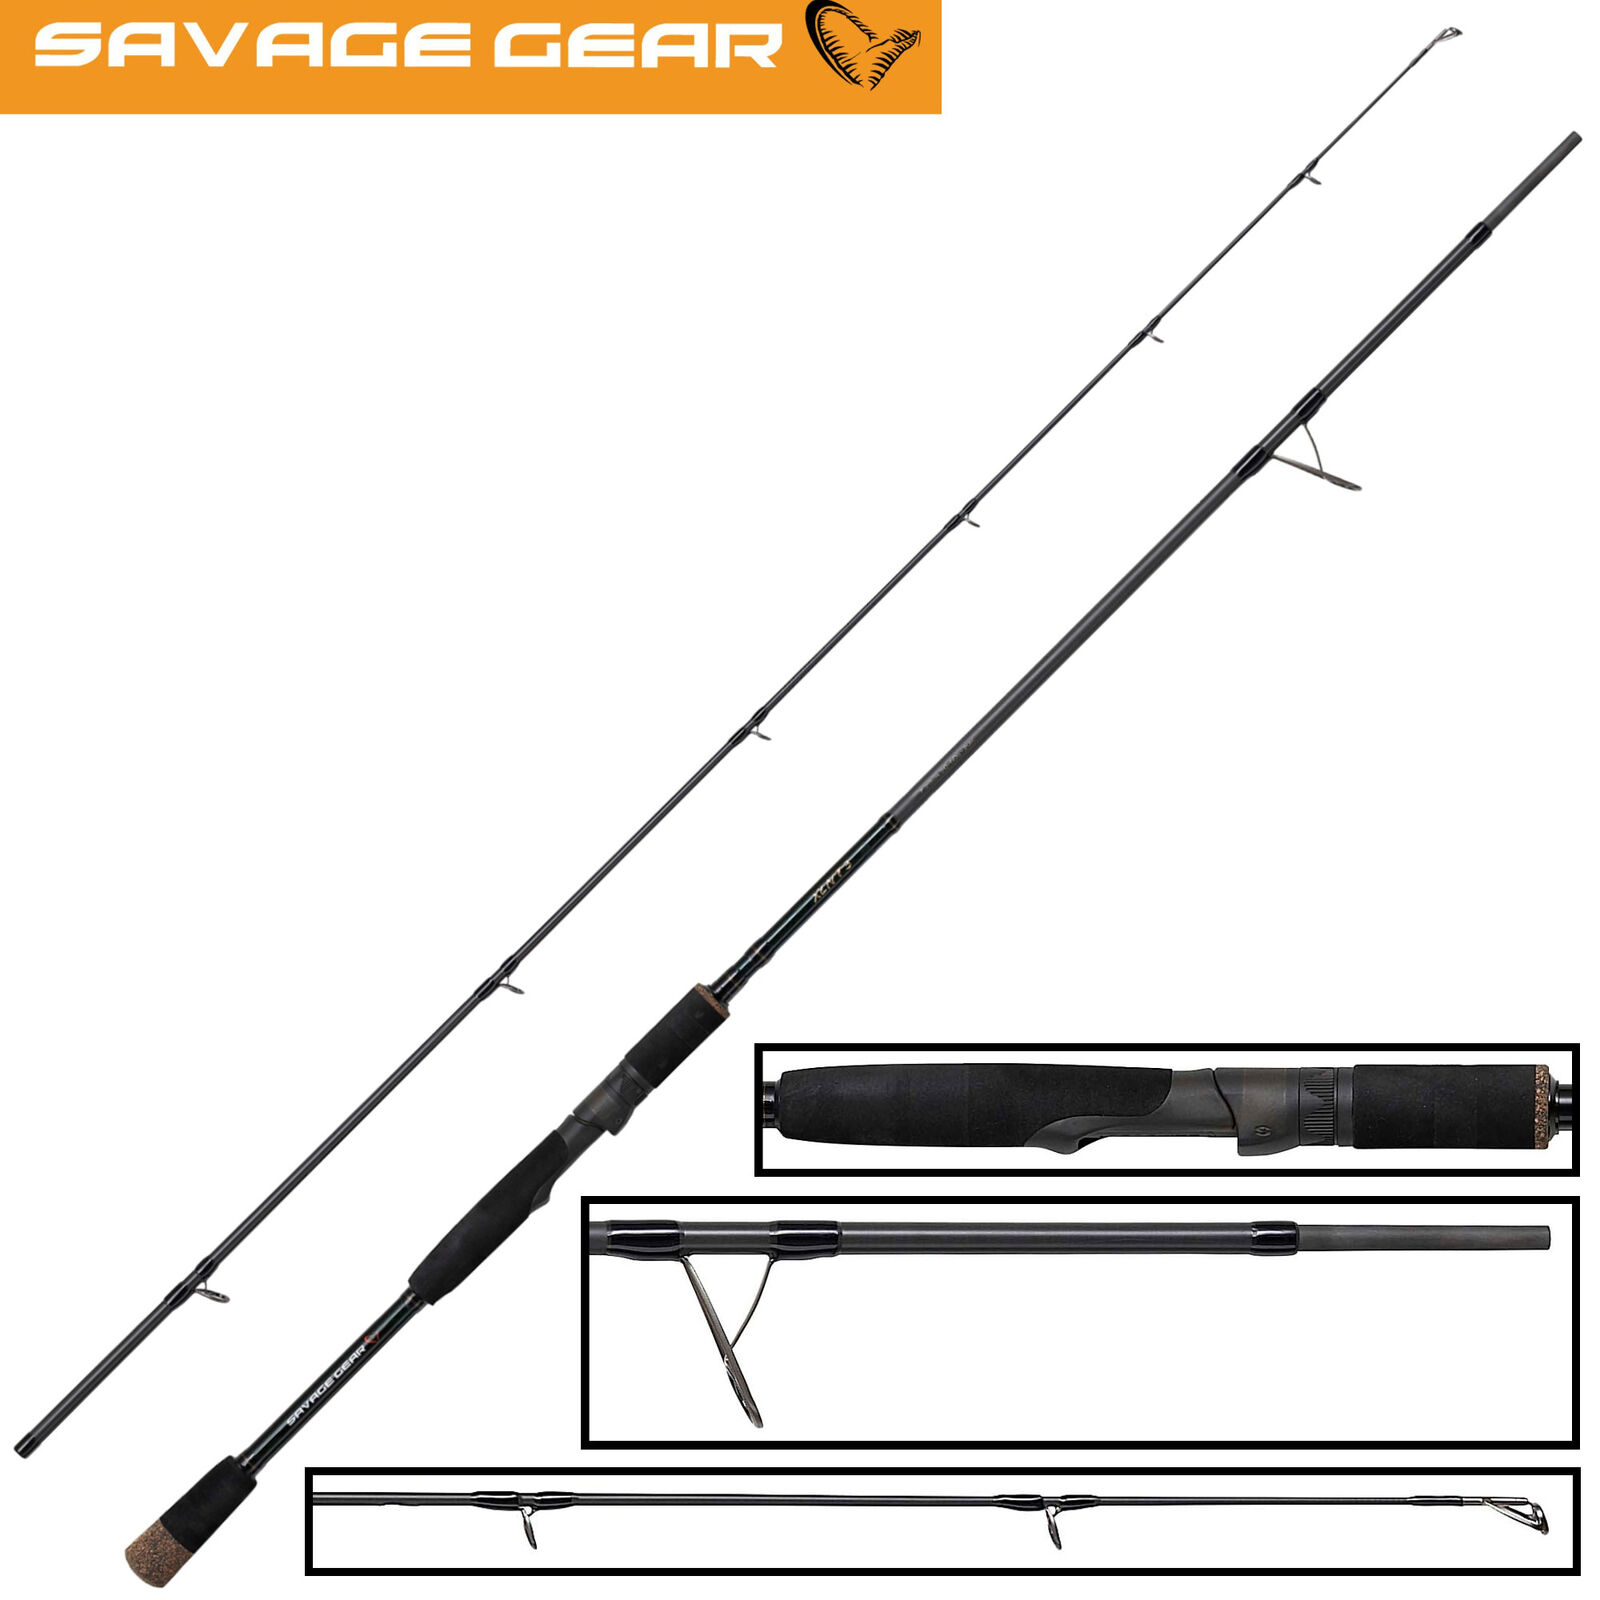 Savage Gear XLNT3 2,13m 20-60g Spinnrute zum Gummifischangeln, Raubfischrute